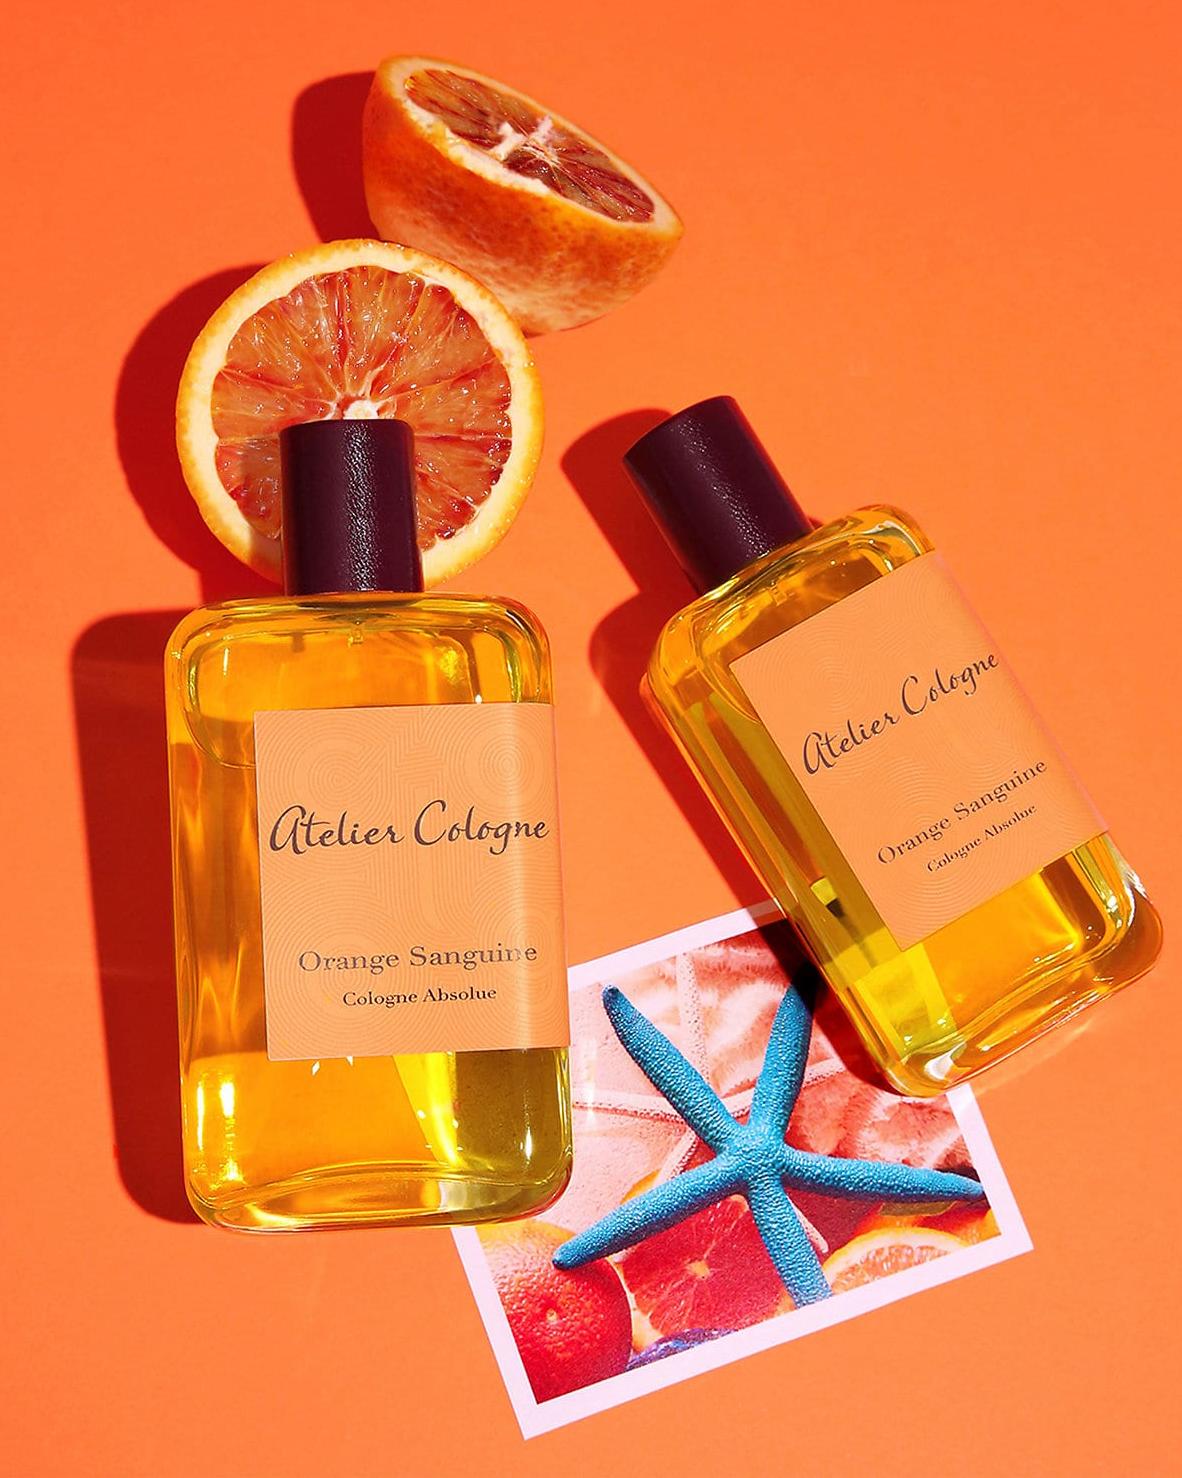 Atelier Cologne Orange Sanguine Limited Edition ~ Новые ароматы